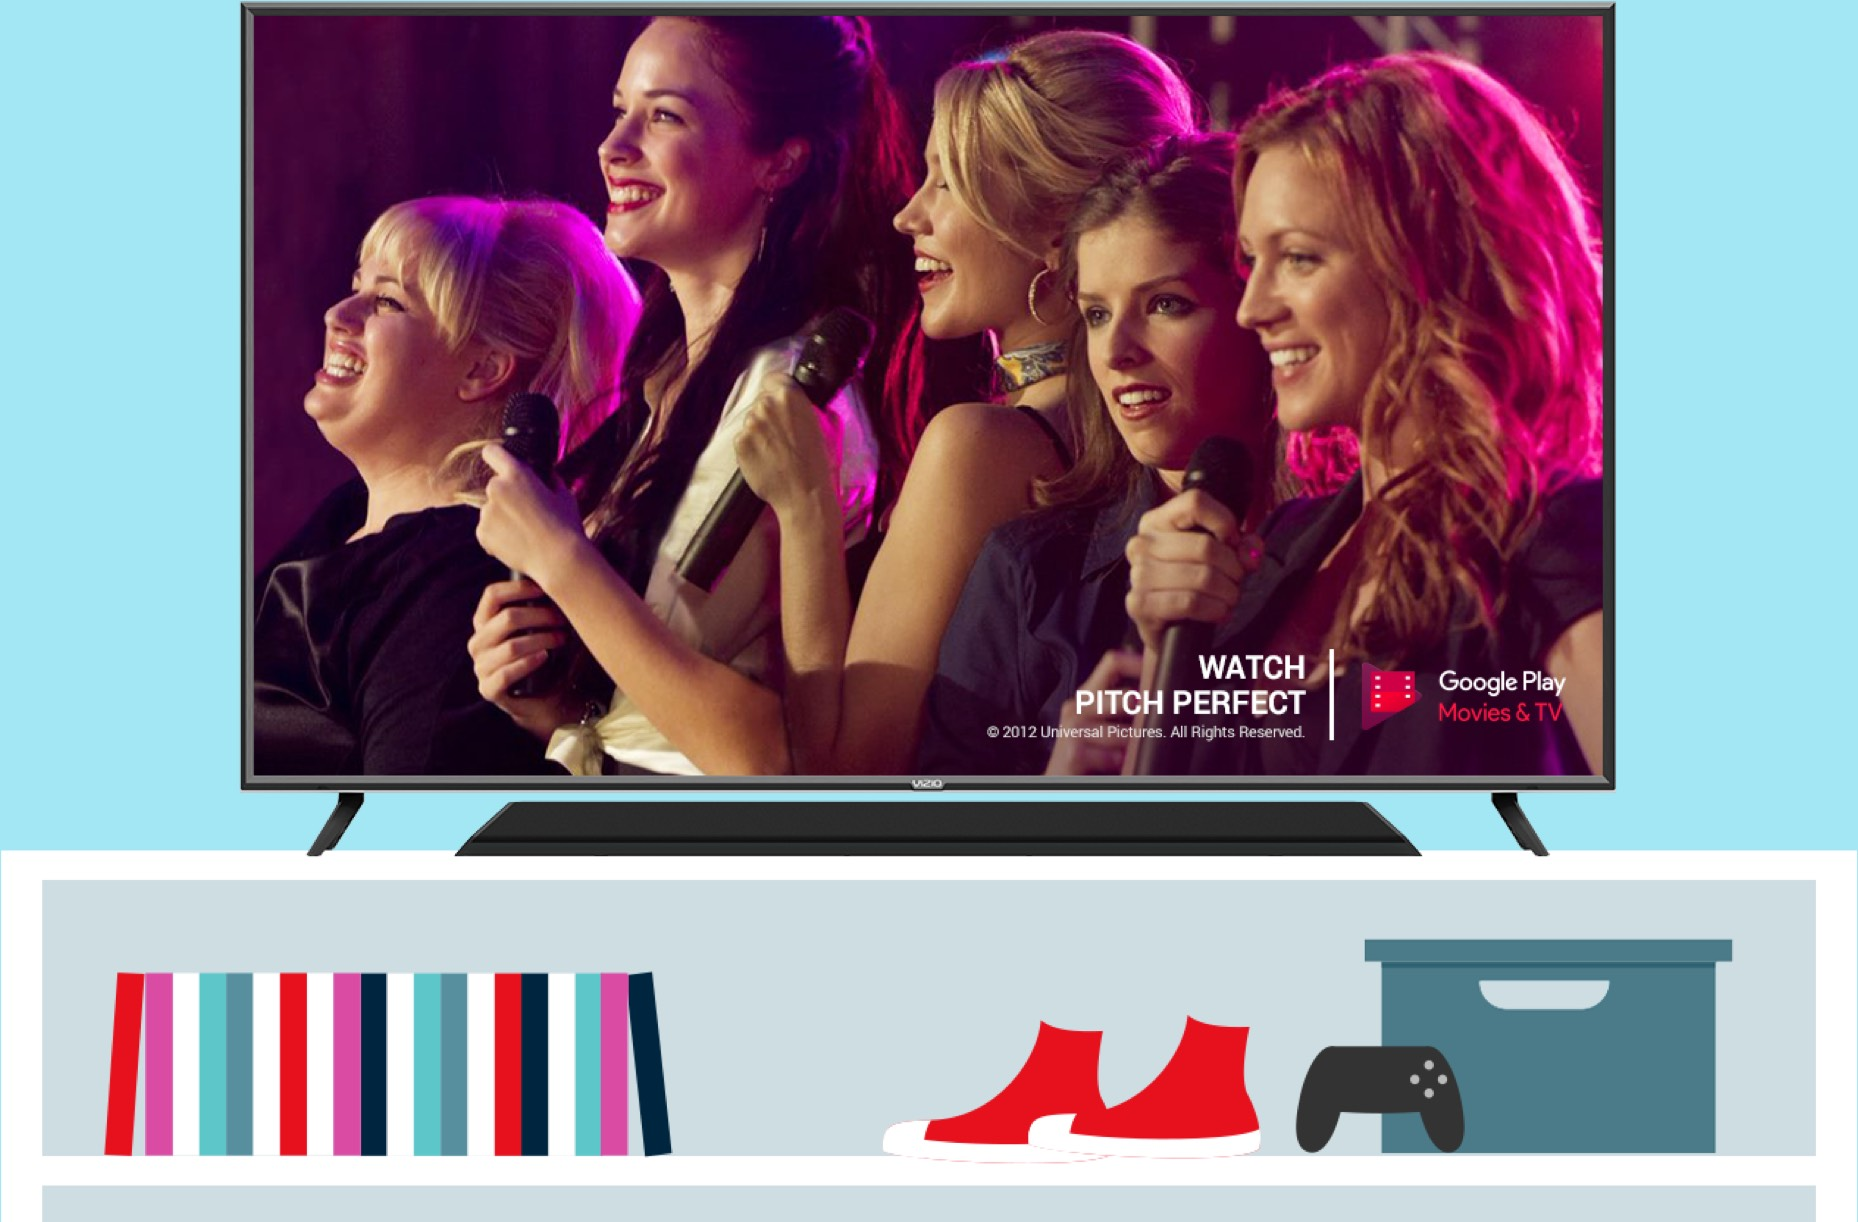 VIZIO TV featuring Pitch Perfect